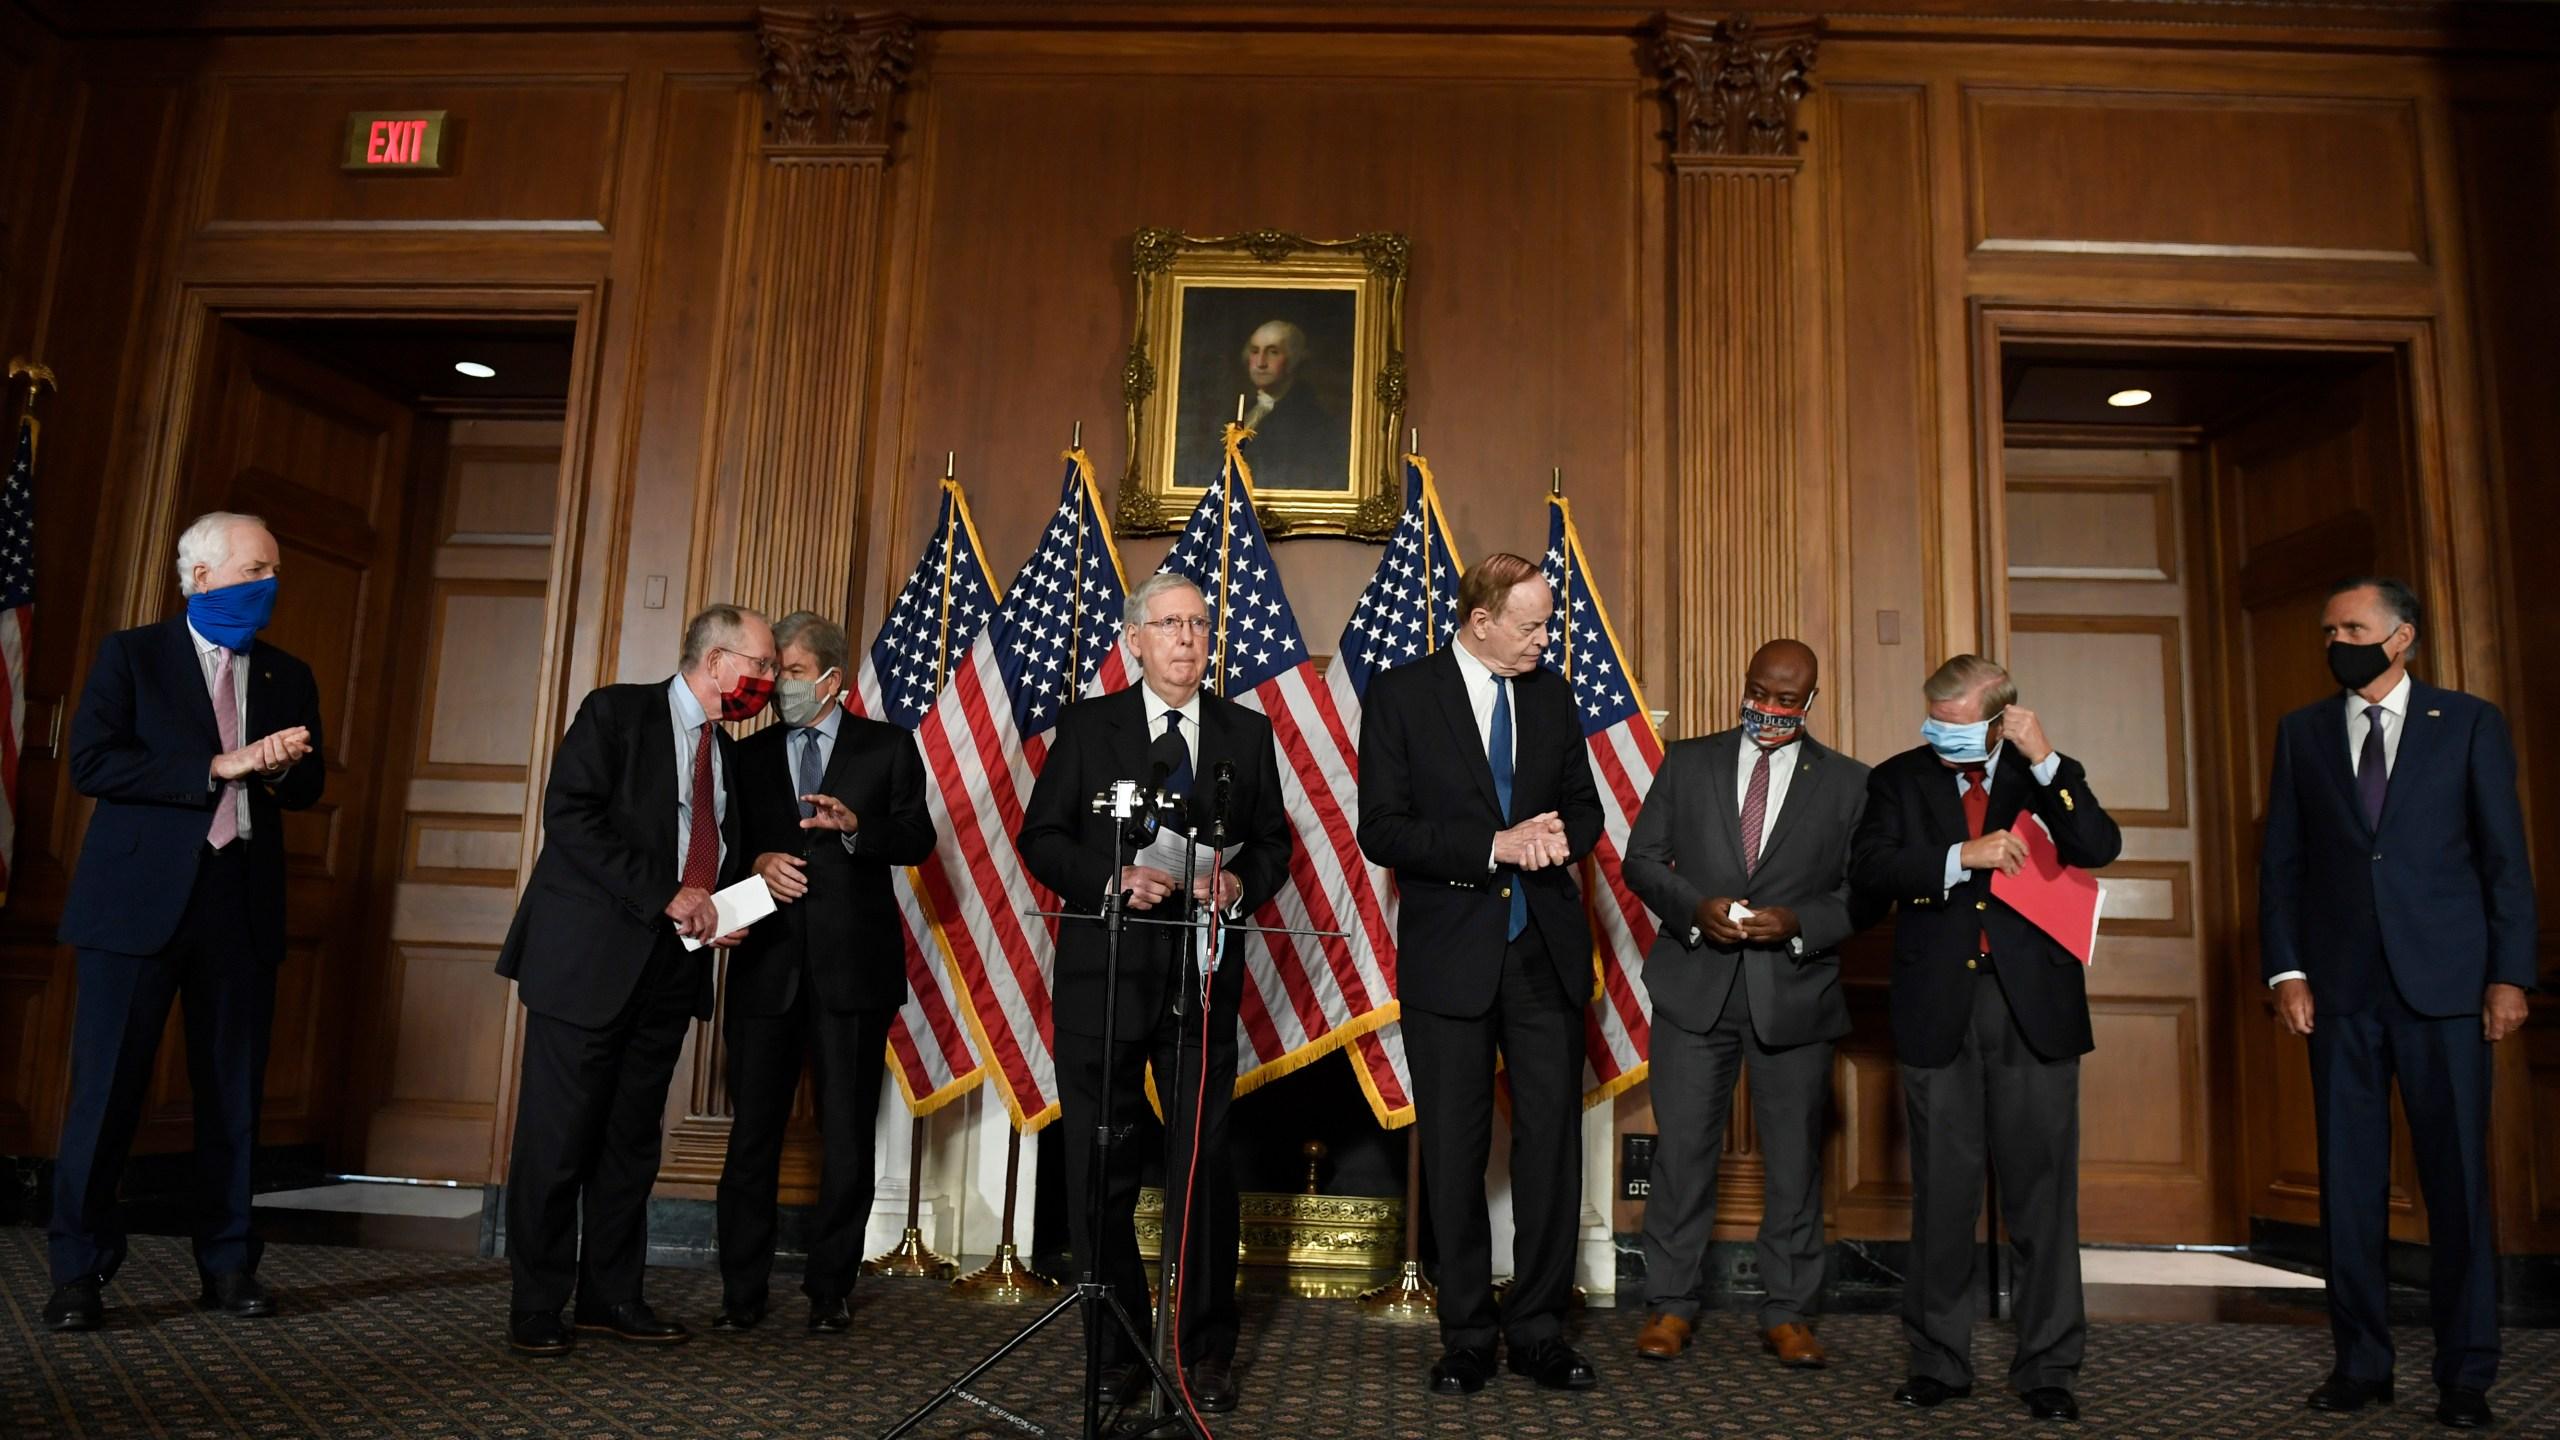 John Cornyn, Lamar Alexander, Roy Blunt, Mitch McConnell, Richard Shelby, Tim Scott, Lindsey Graham, Mitt Romney